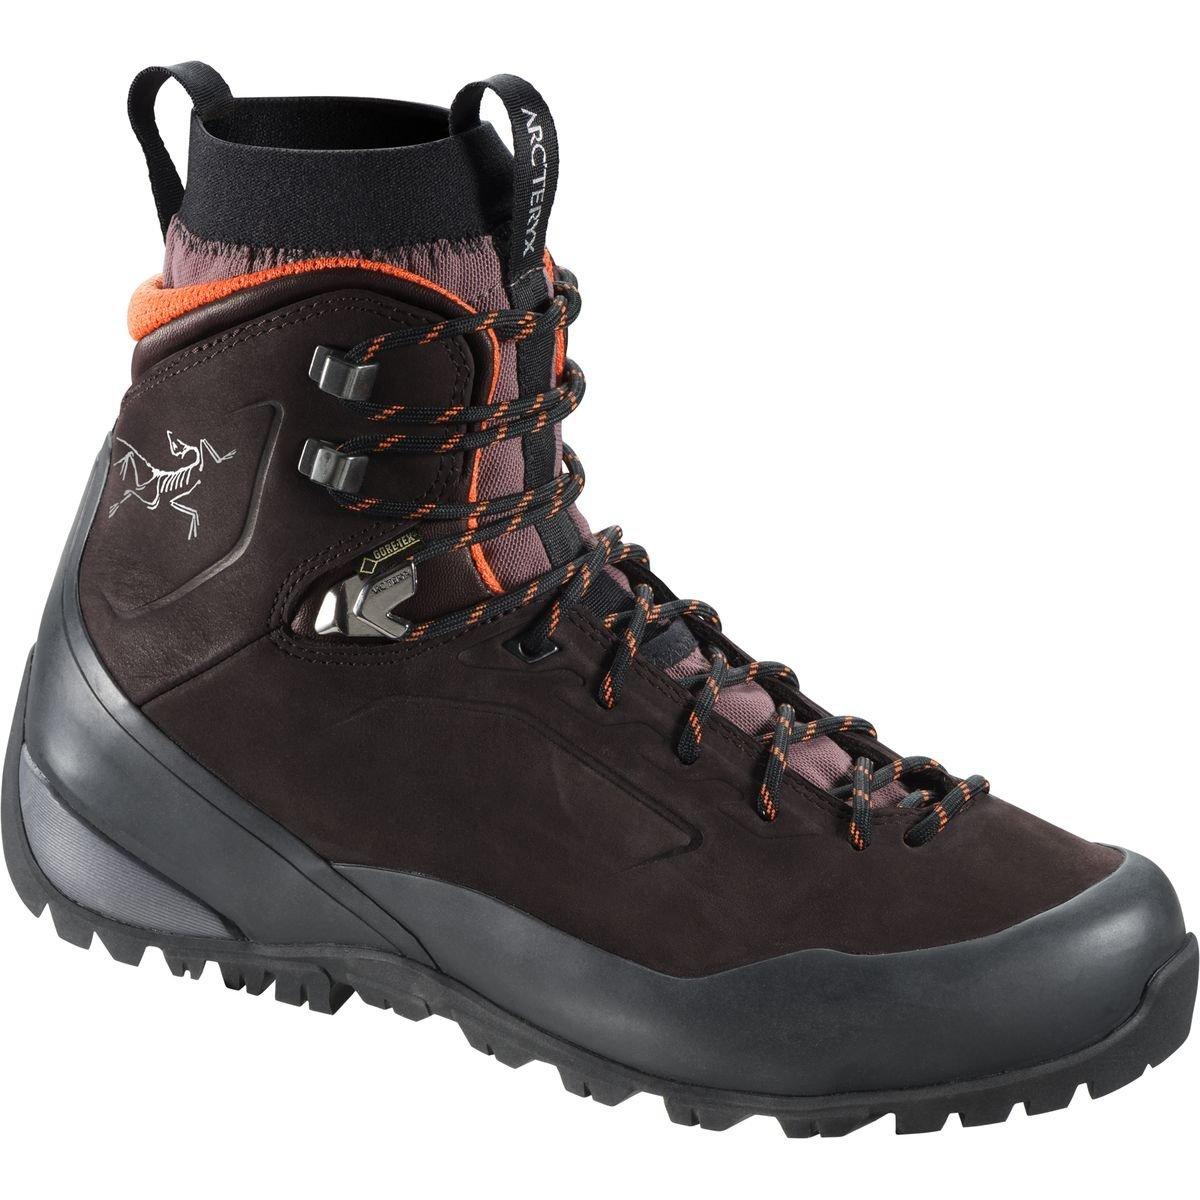 c8d6b2274ce Amazon.com: Arc'teryx Bora Mid Leather GTX Hiking Boot - Women's ...